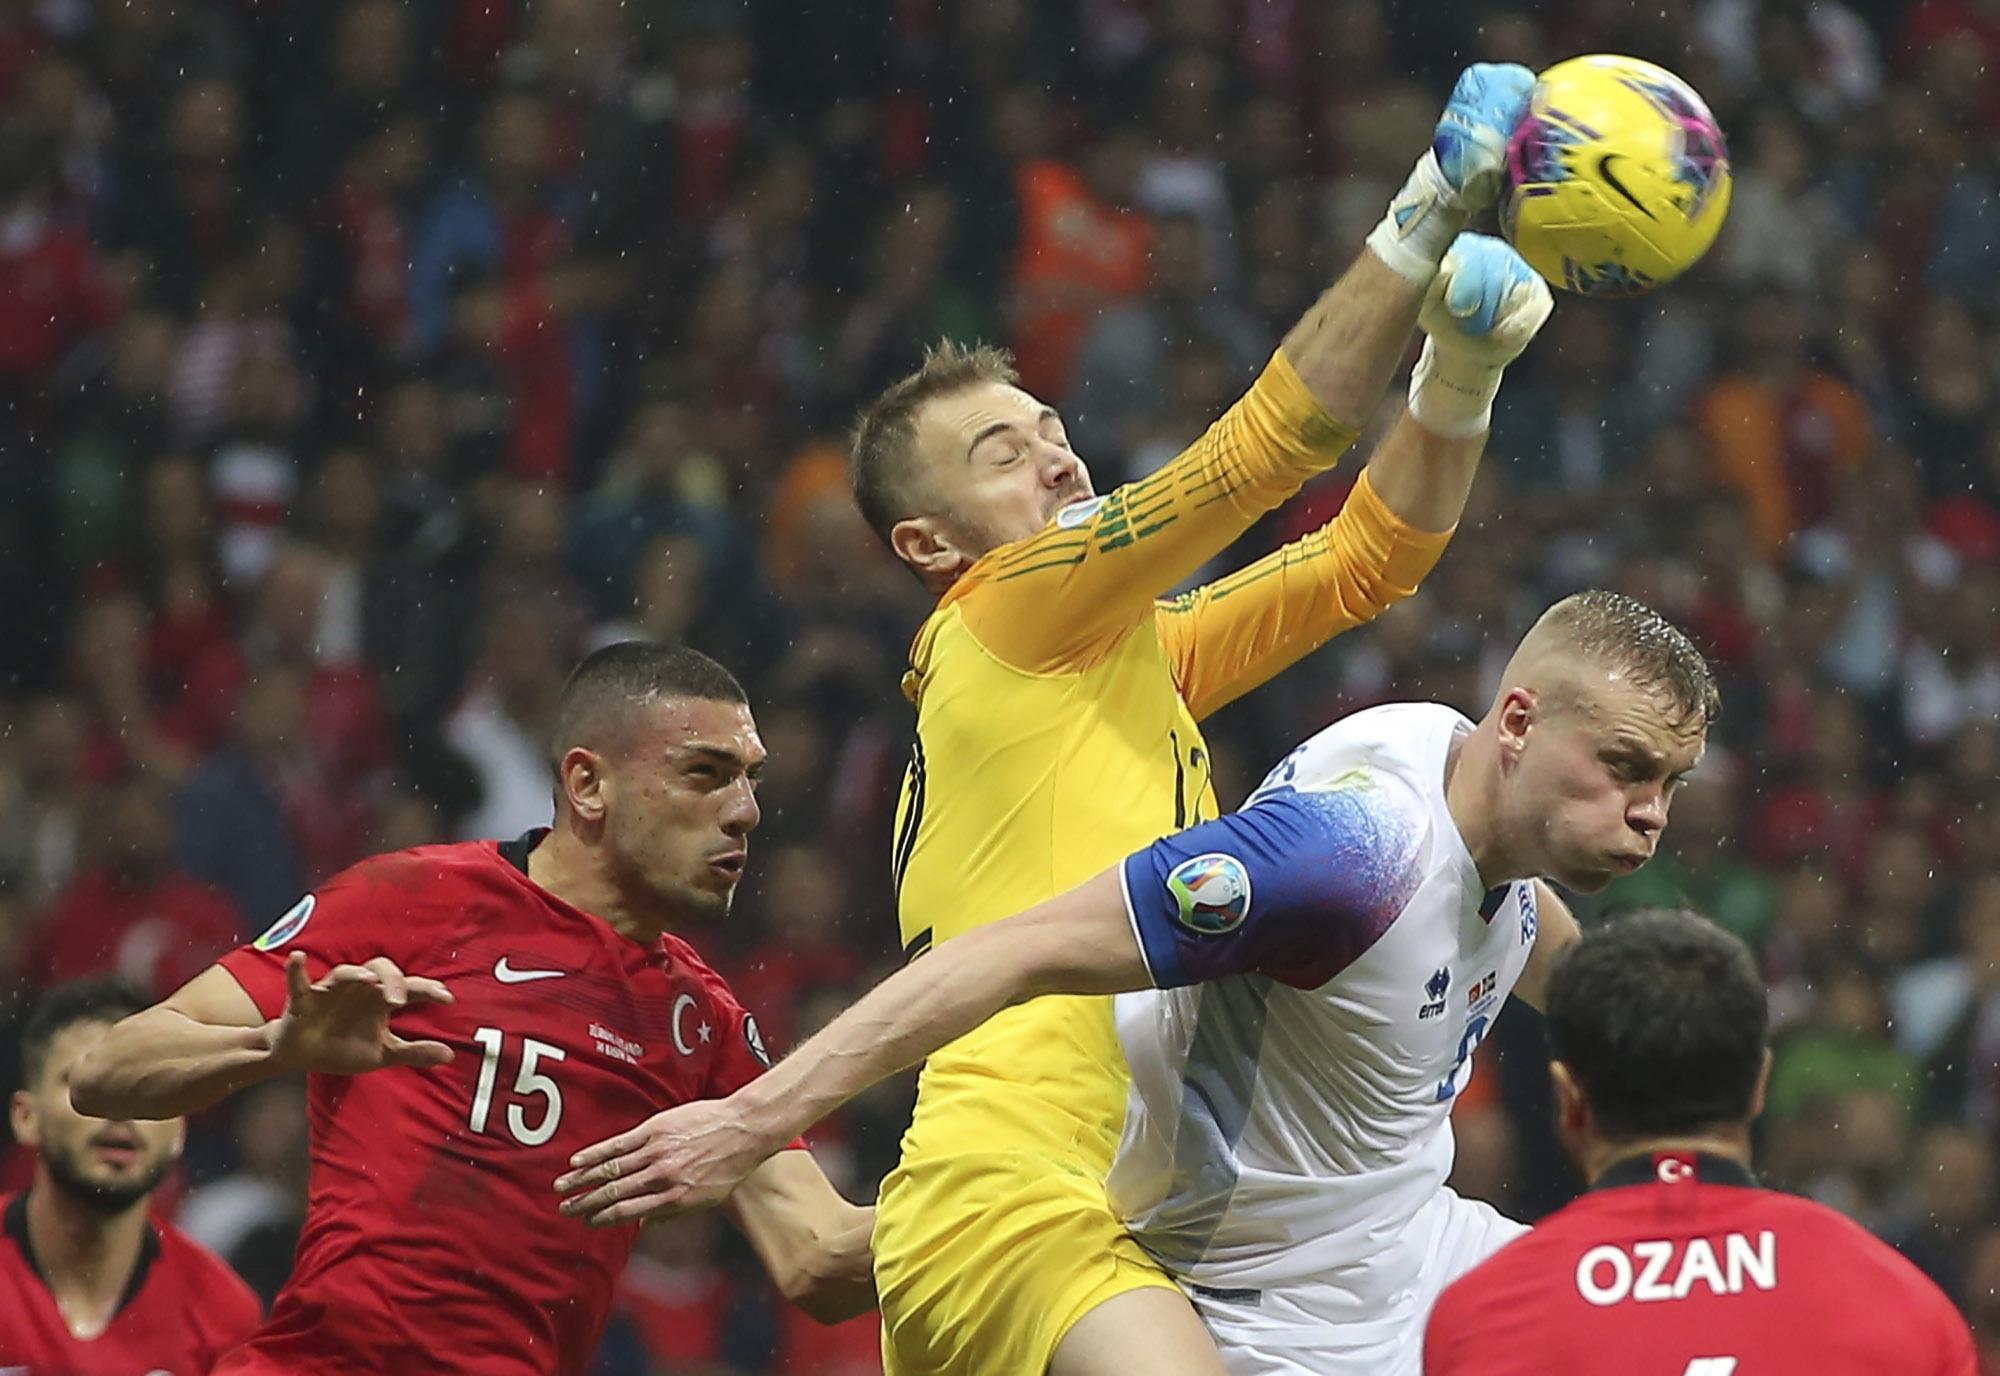 Calendrier De Match Euro 2020.England Czech Republic France And Turkey Reach Euro 2020